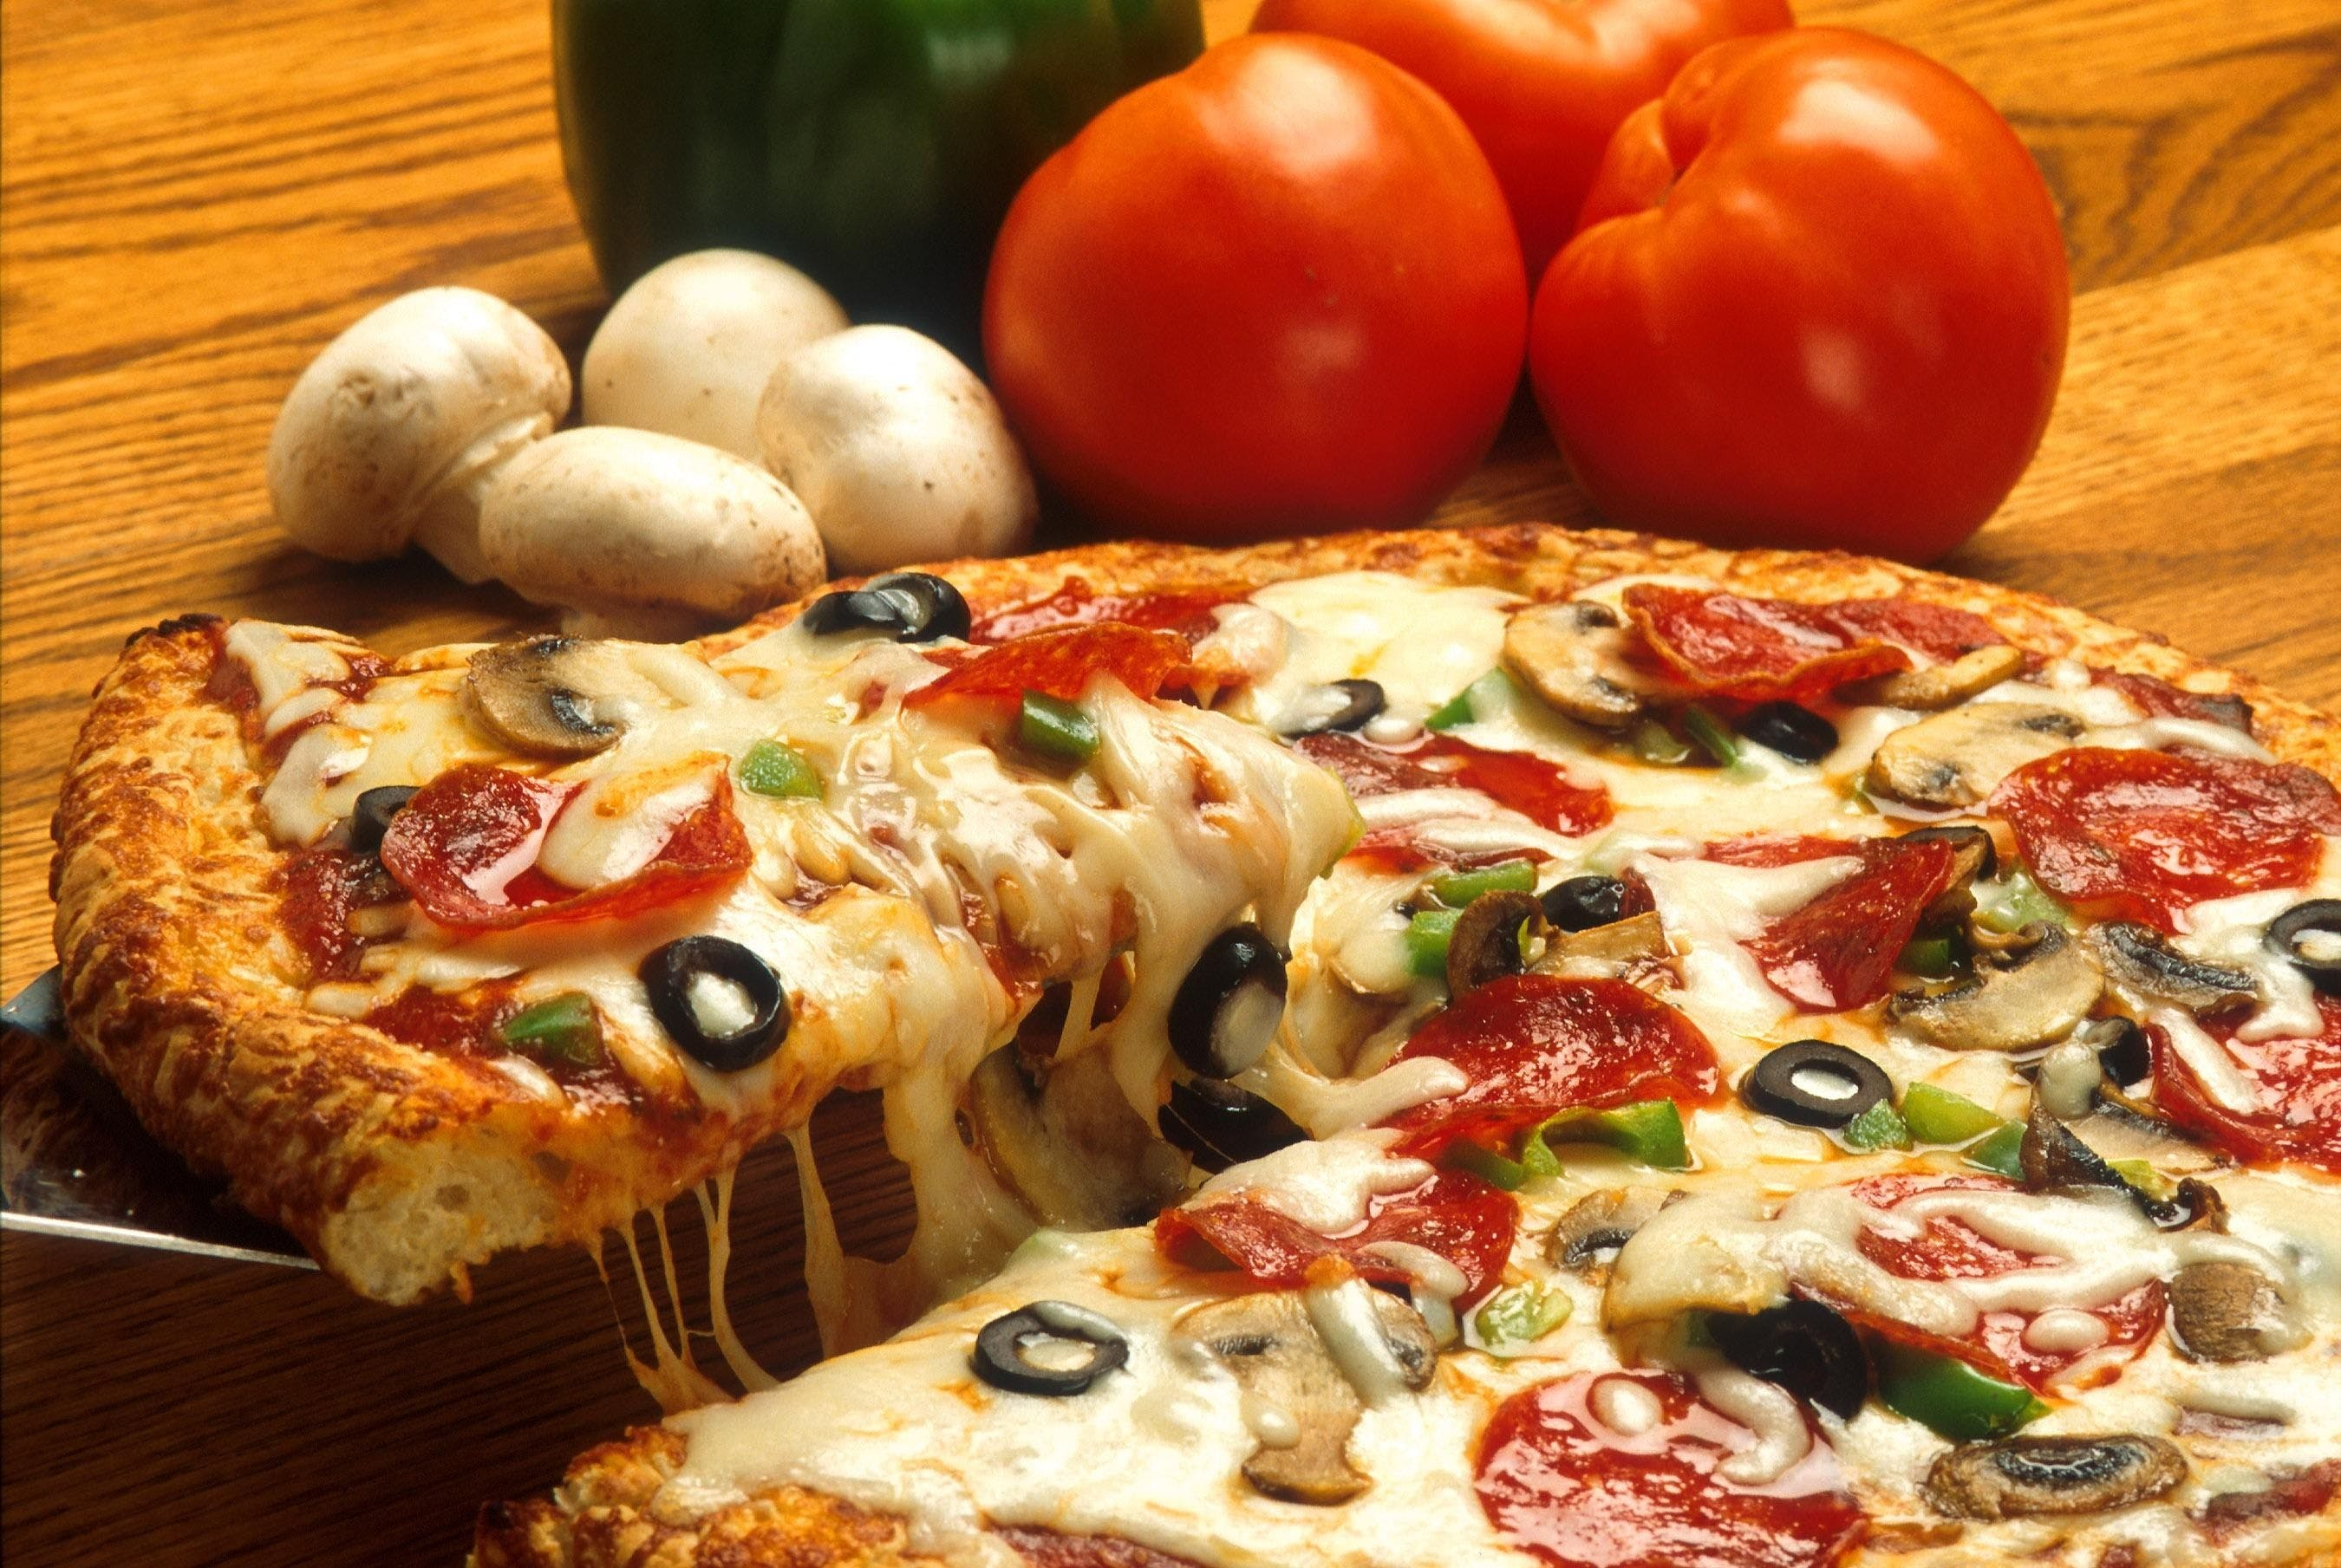 Mozzarella Pizza Beside Mushrooms and Tomatoes